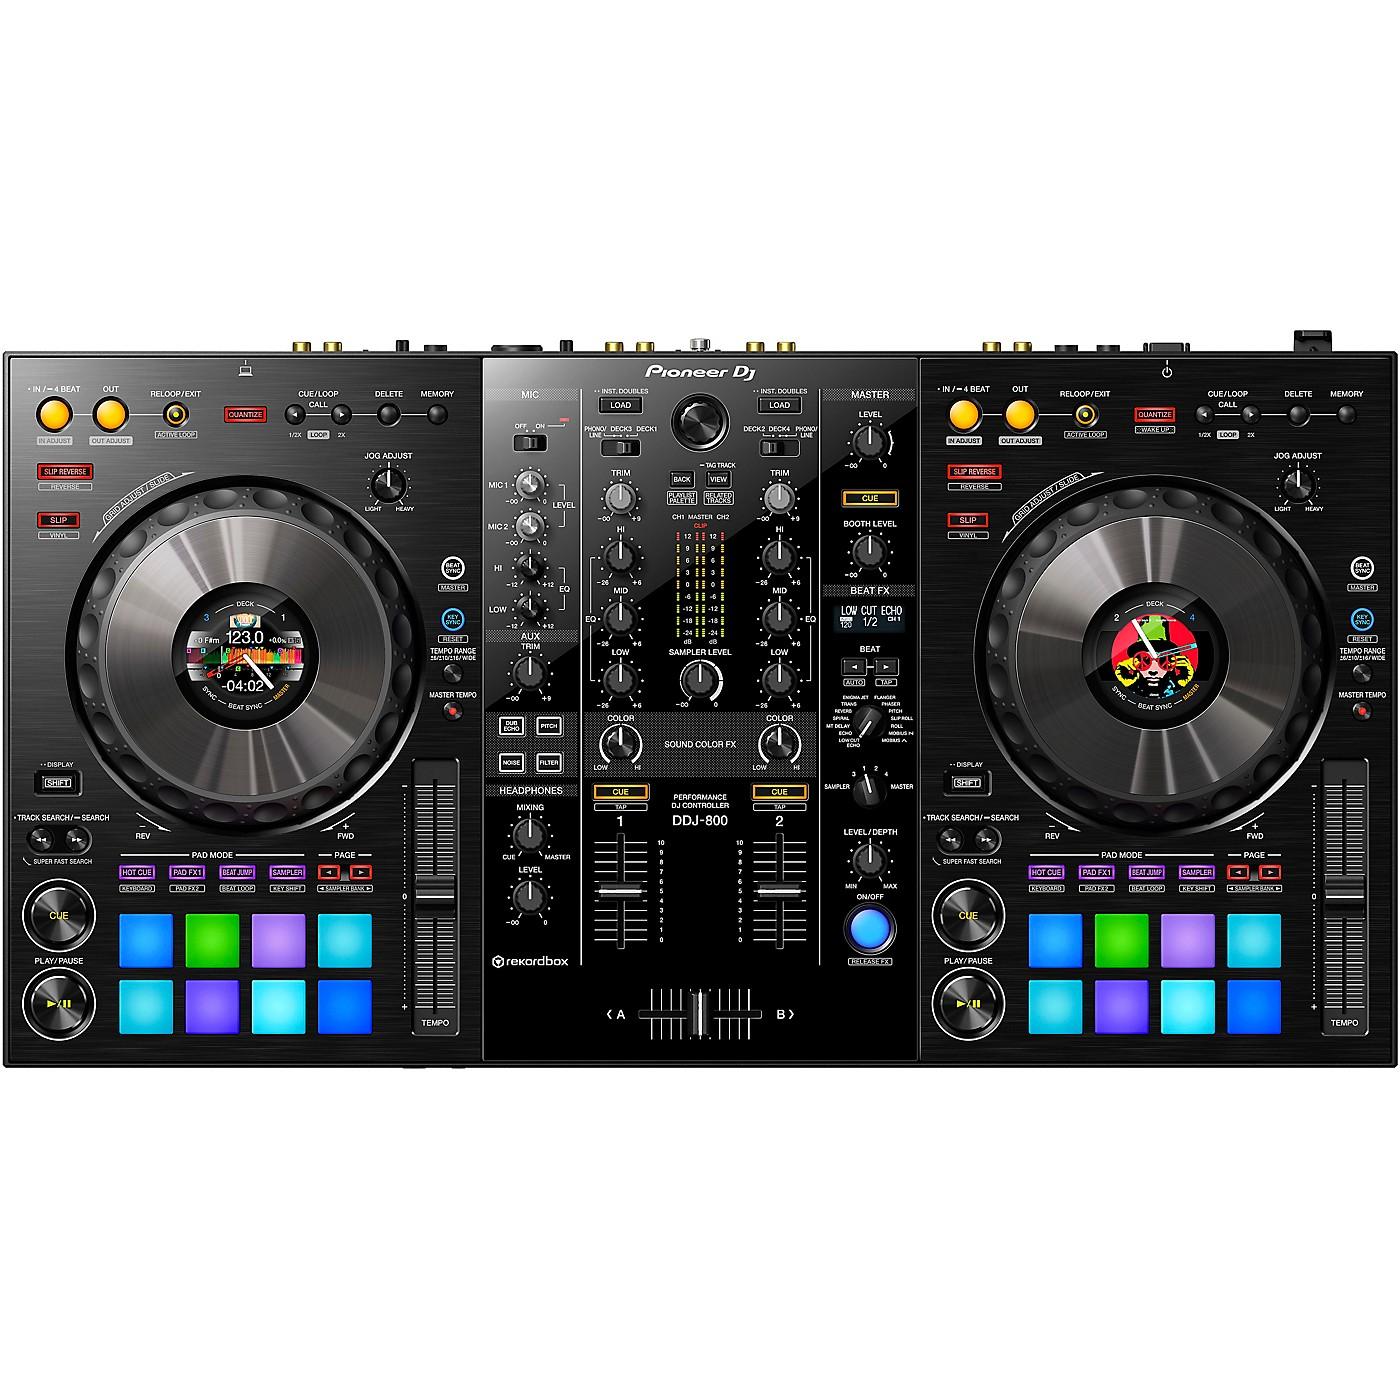 Pioneer DJ DDJ-800 2-Channel Controller for rekordbox dj thumbnail